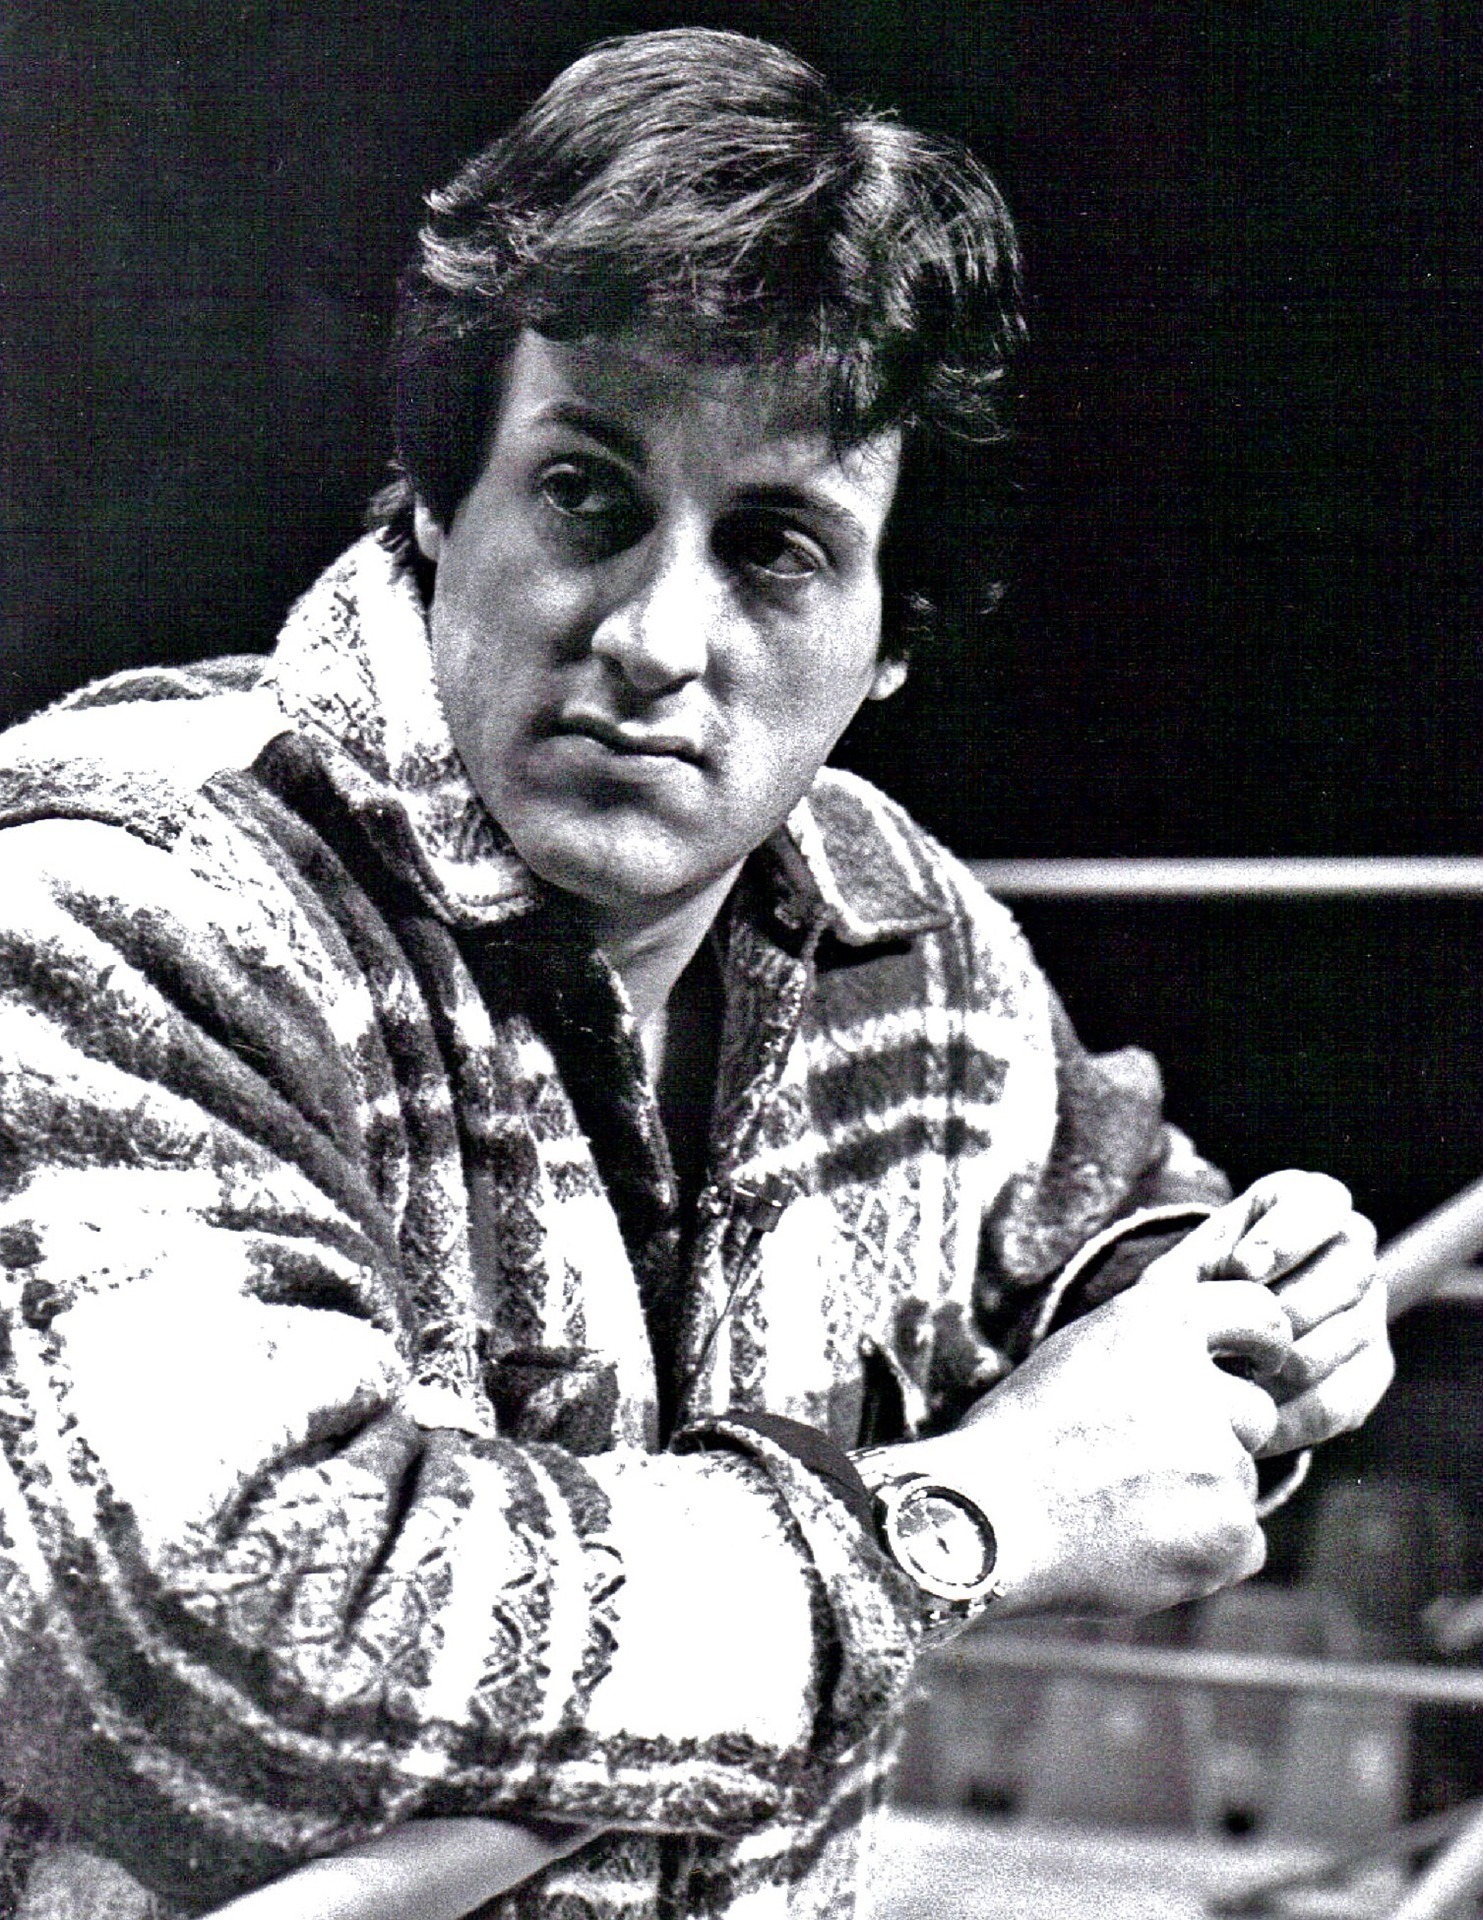 Sylvester Stallone story